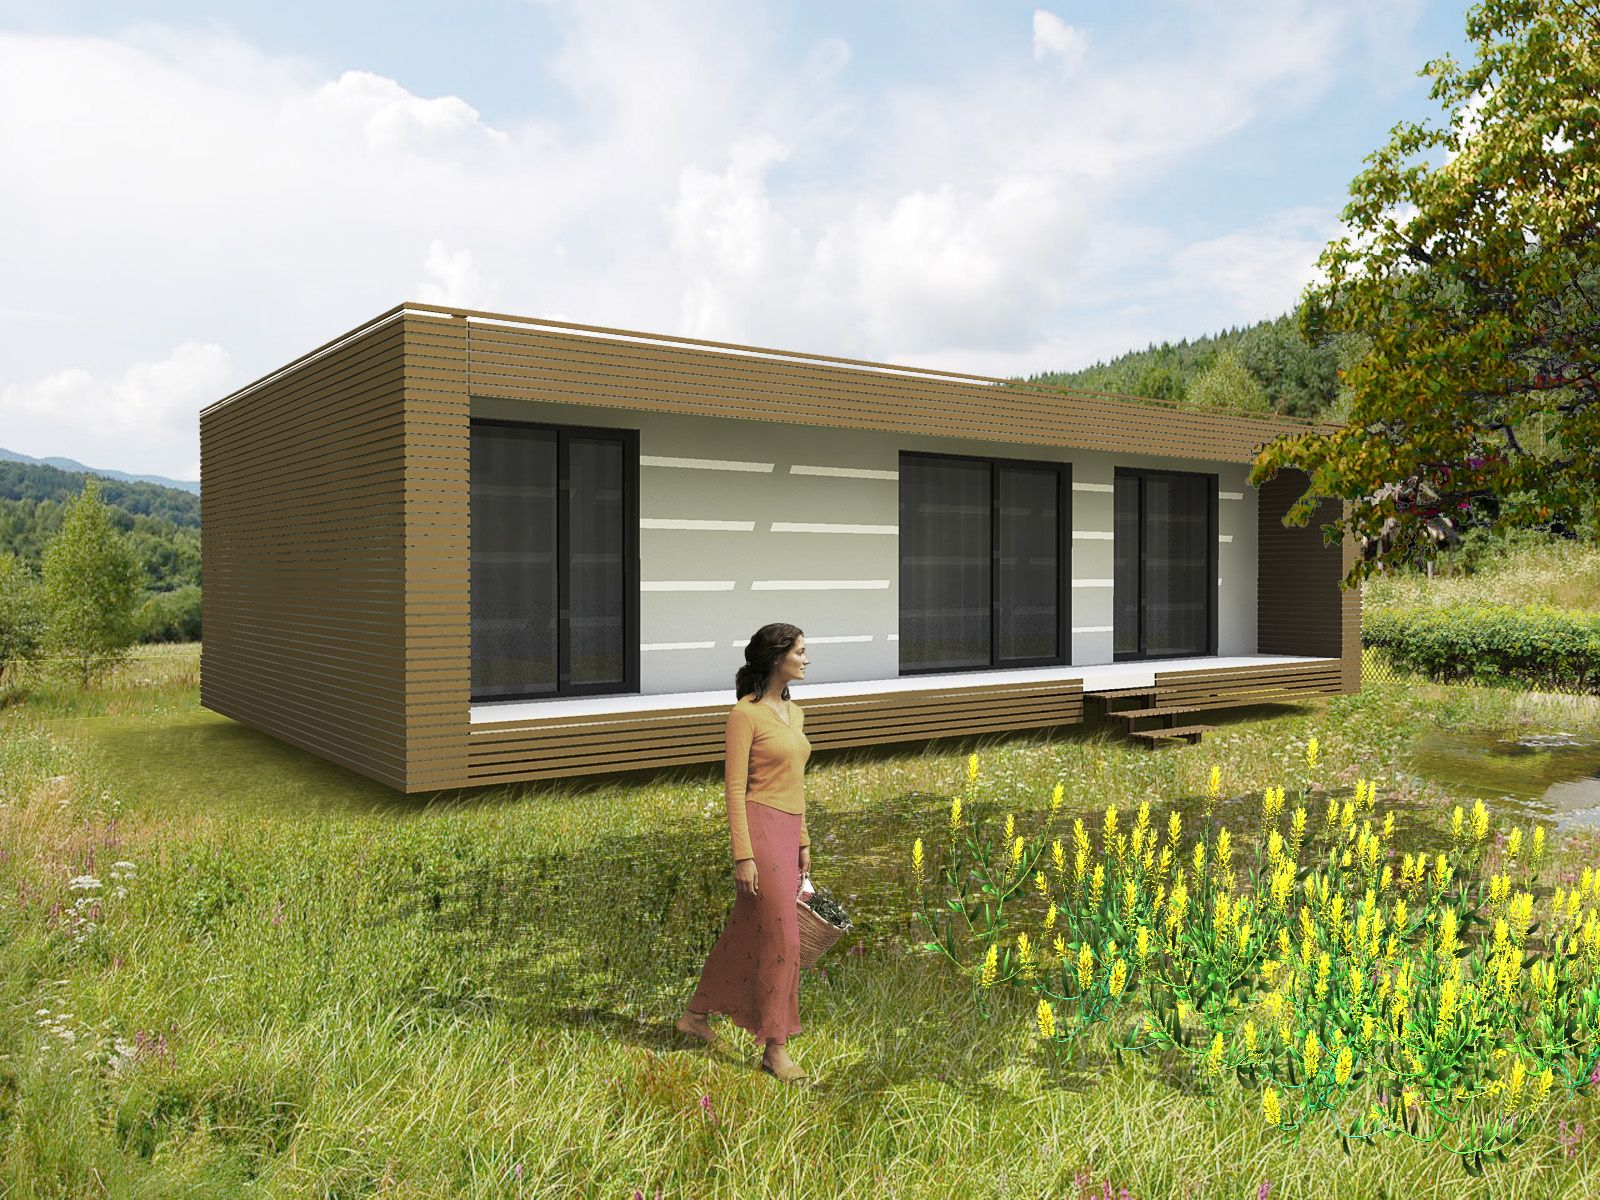 Enjoyable Chic Modern Prefab Homes Dallas With Modern Prefab Homes Home Interior And Landscaping Ponolsignezvosmurscom